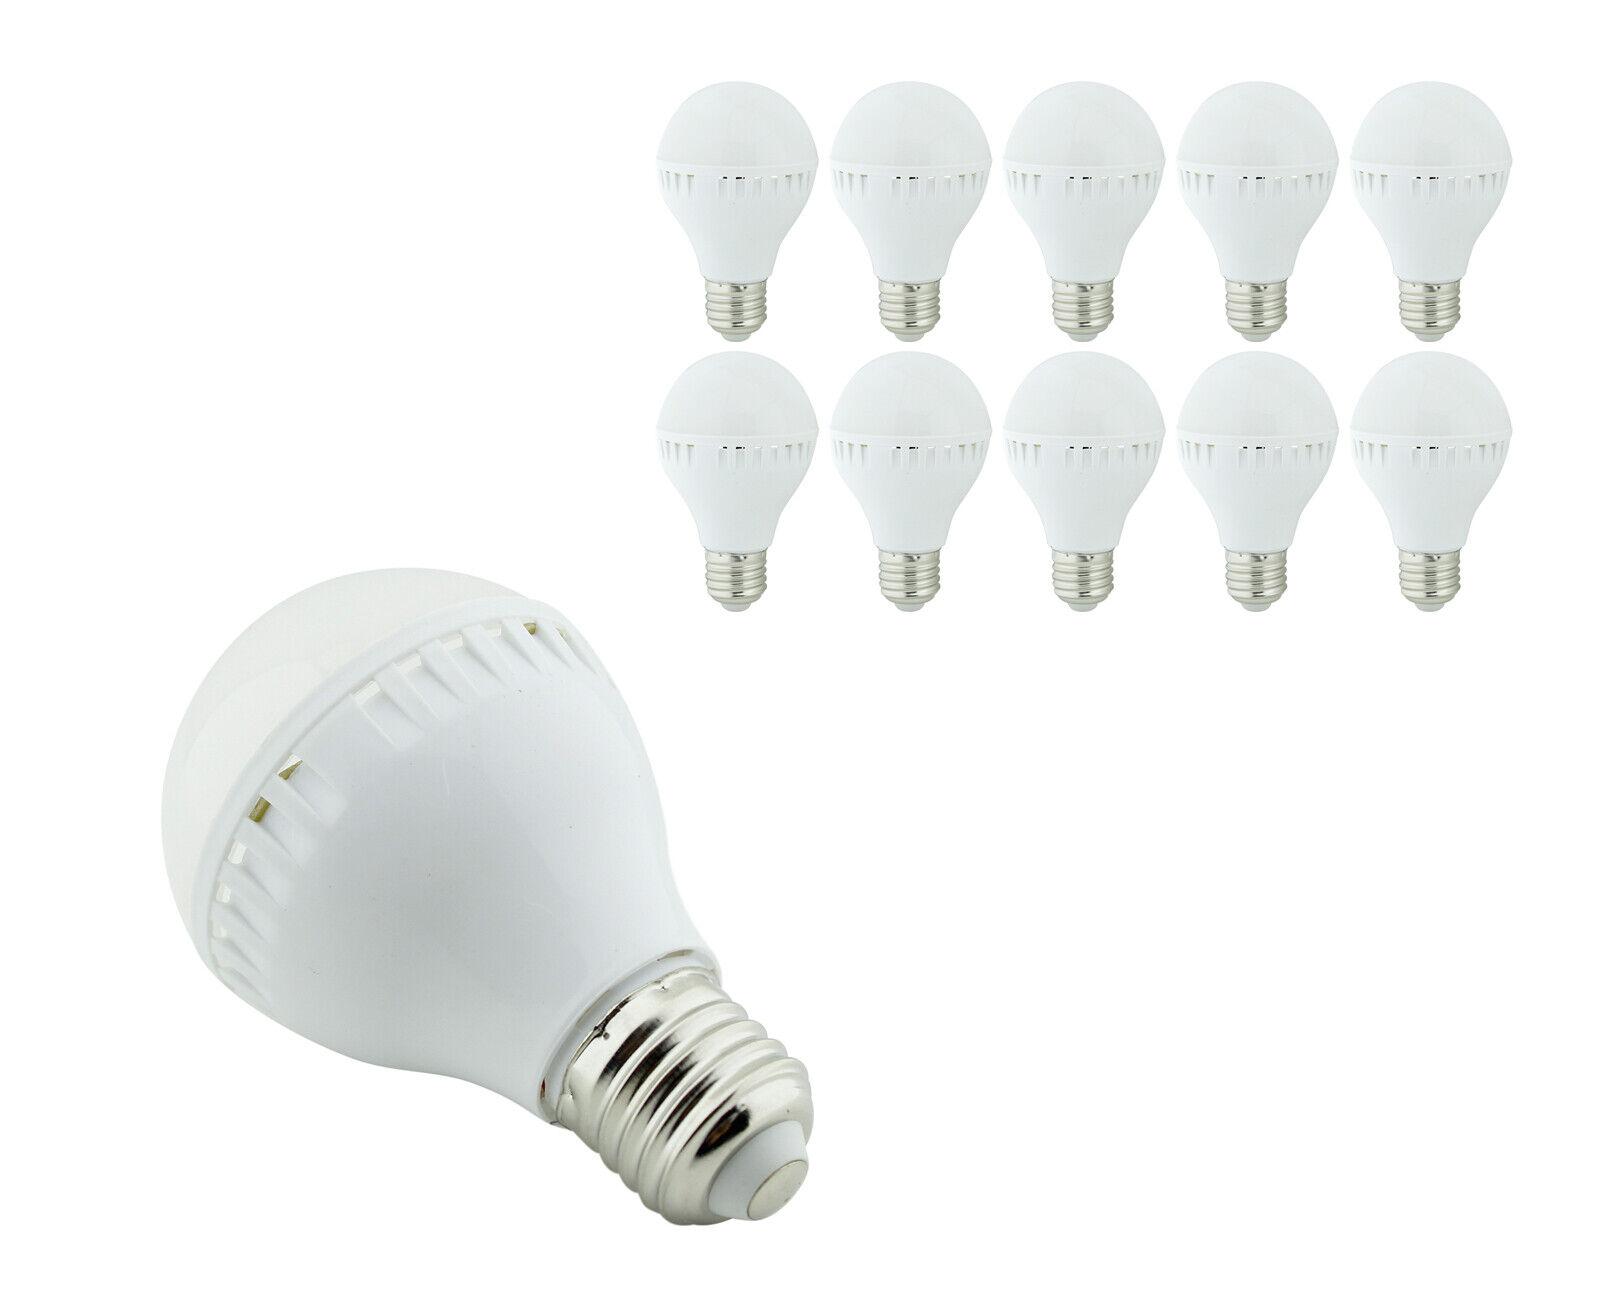 10stk E27 LED 9W Leuchte Leuchtmittel Energiesparlampe Lampe Birne Glühbirne